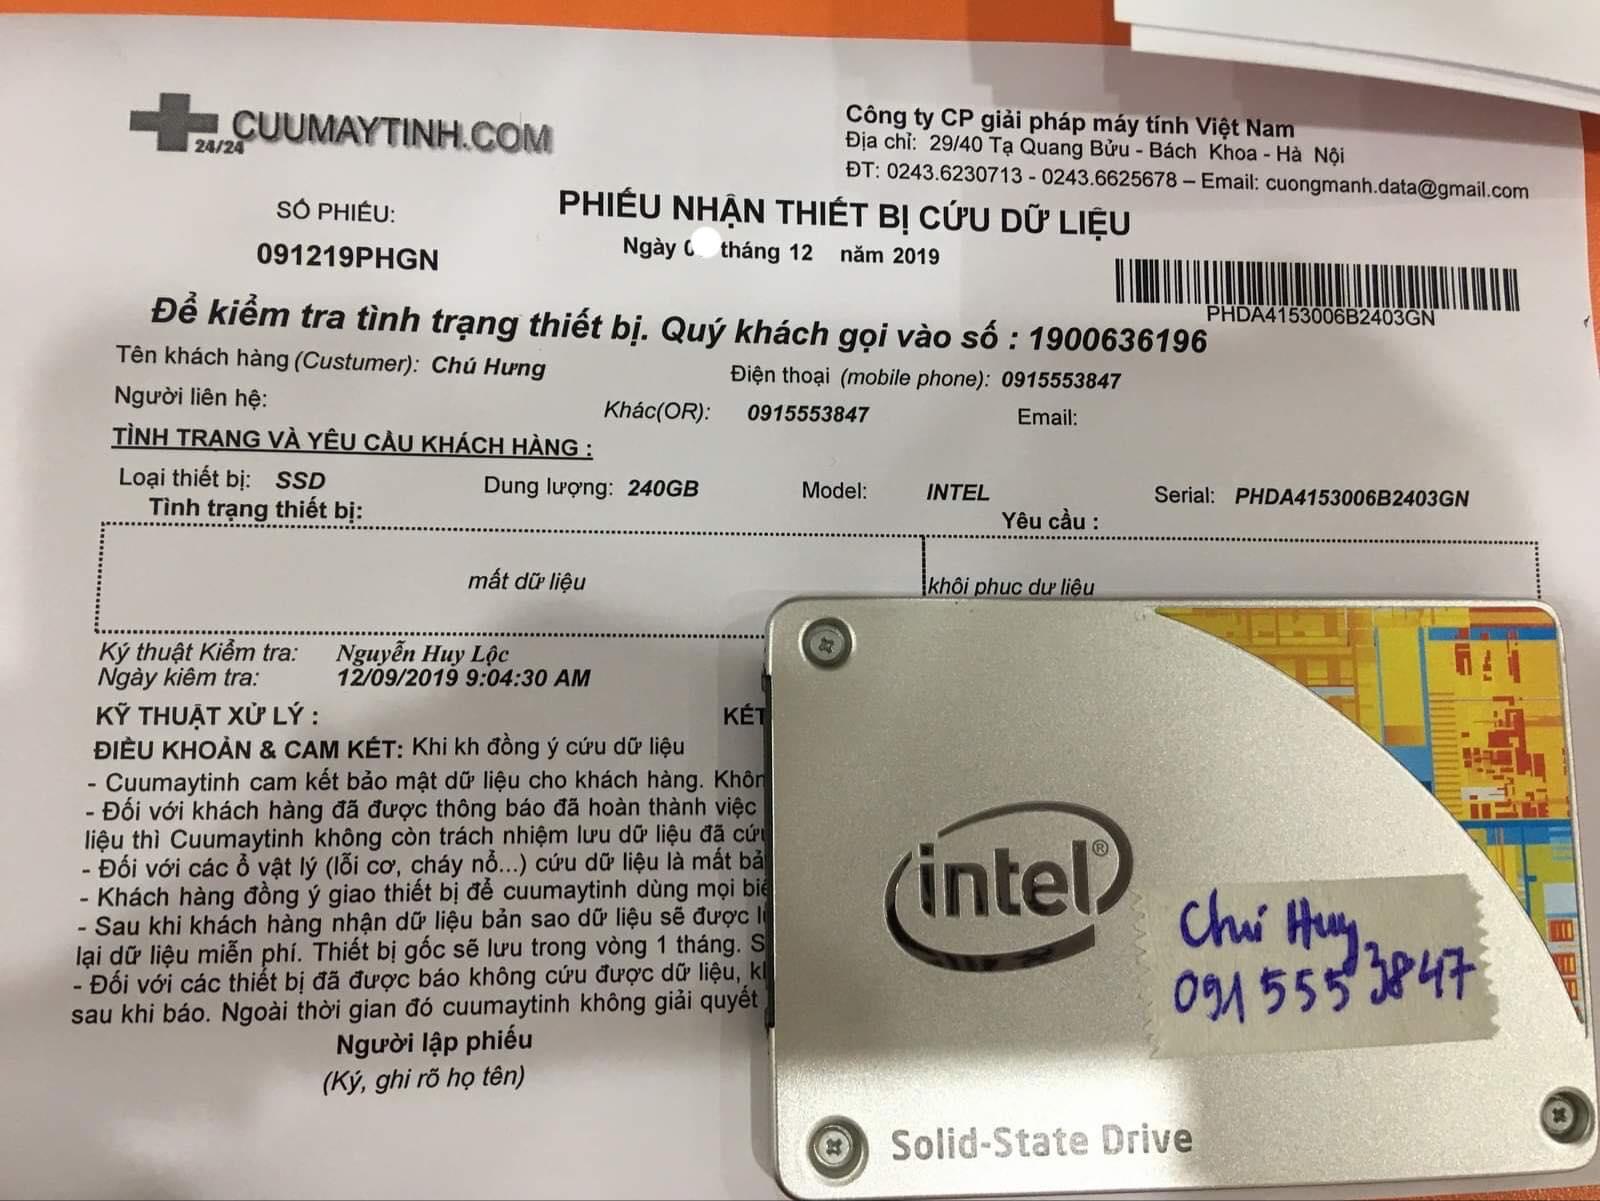 Phục hồi dữ liệu ổ cứng SSD Intel 240GB mất dữ liệu 16/12/2019 - cuumaytinh